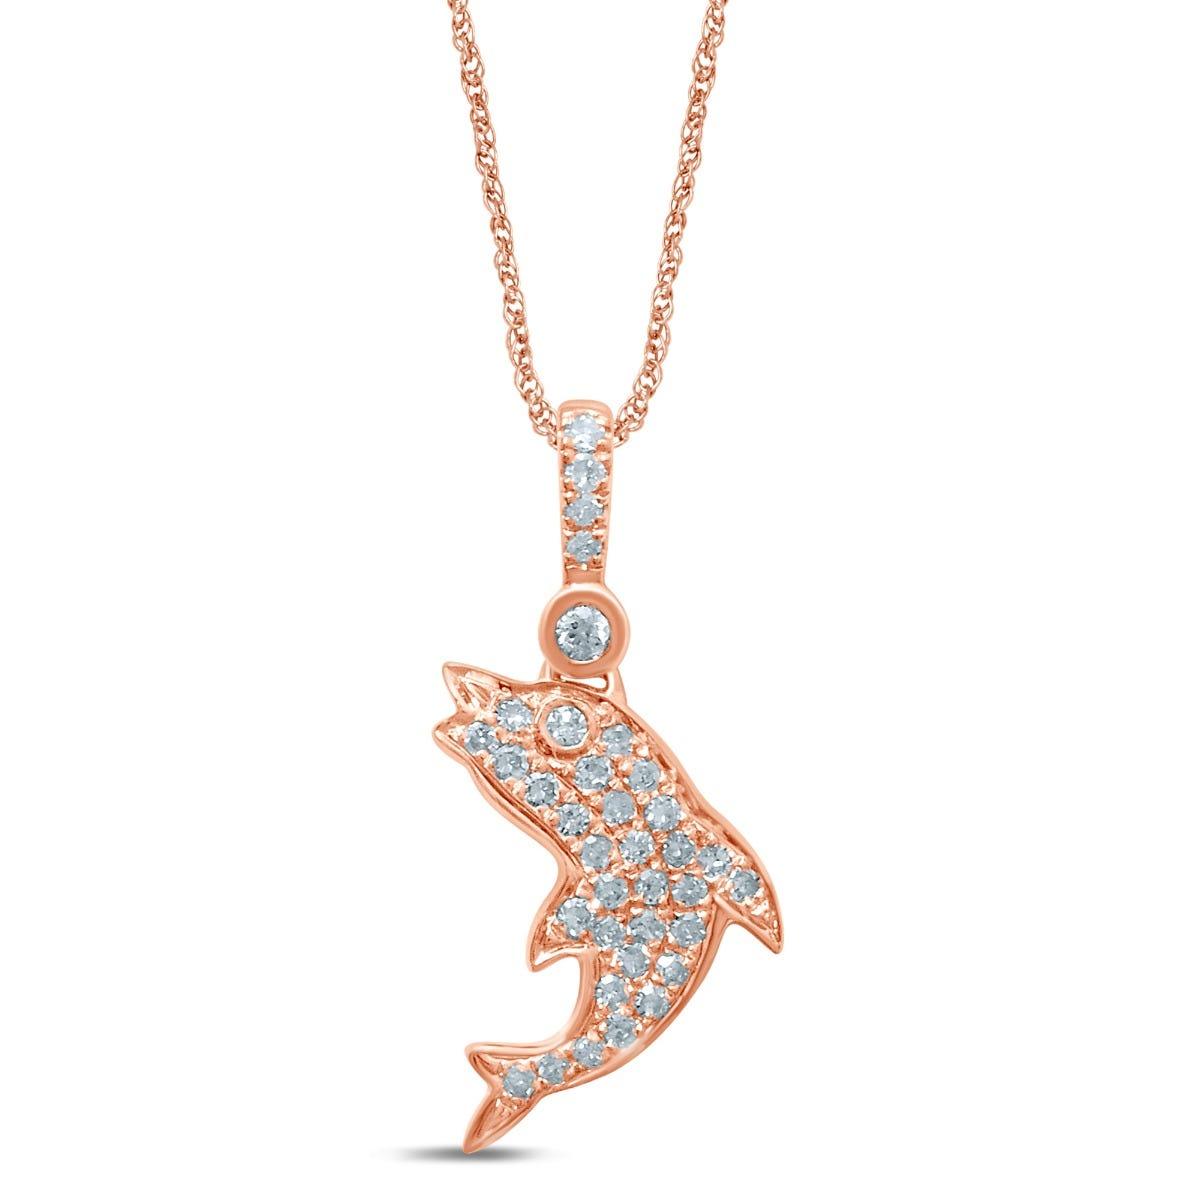 Diamond Fashion Pendant in 10k Rose Gold